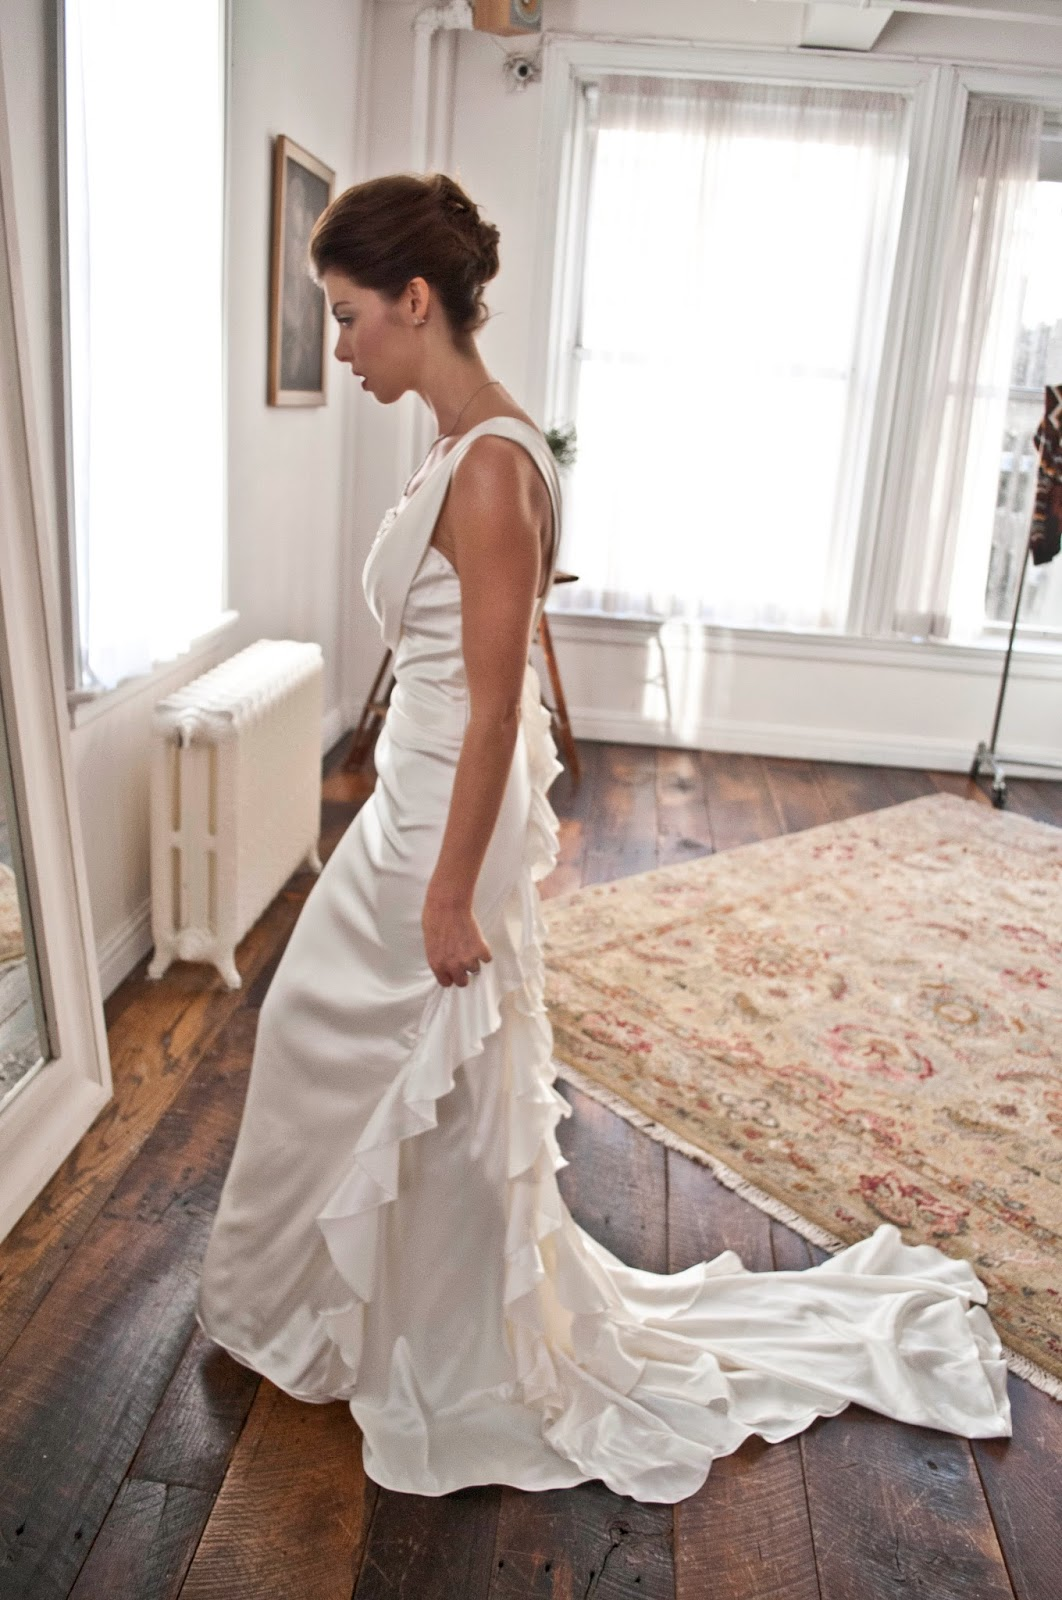 garys-lofts-new-york-wedding-5